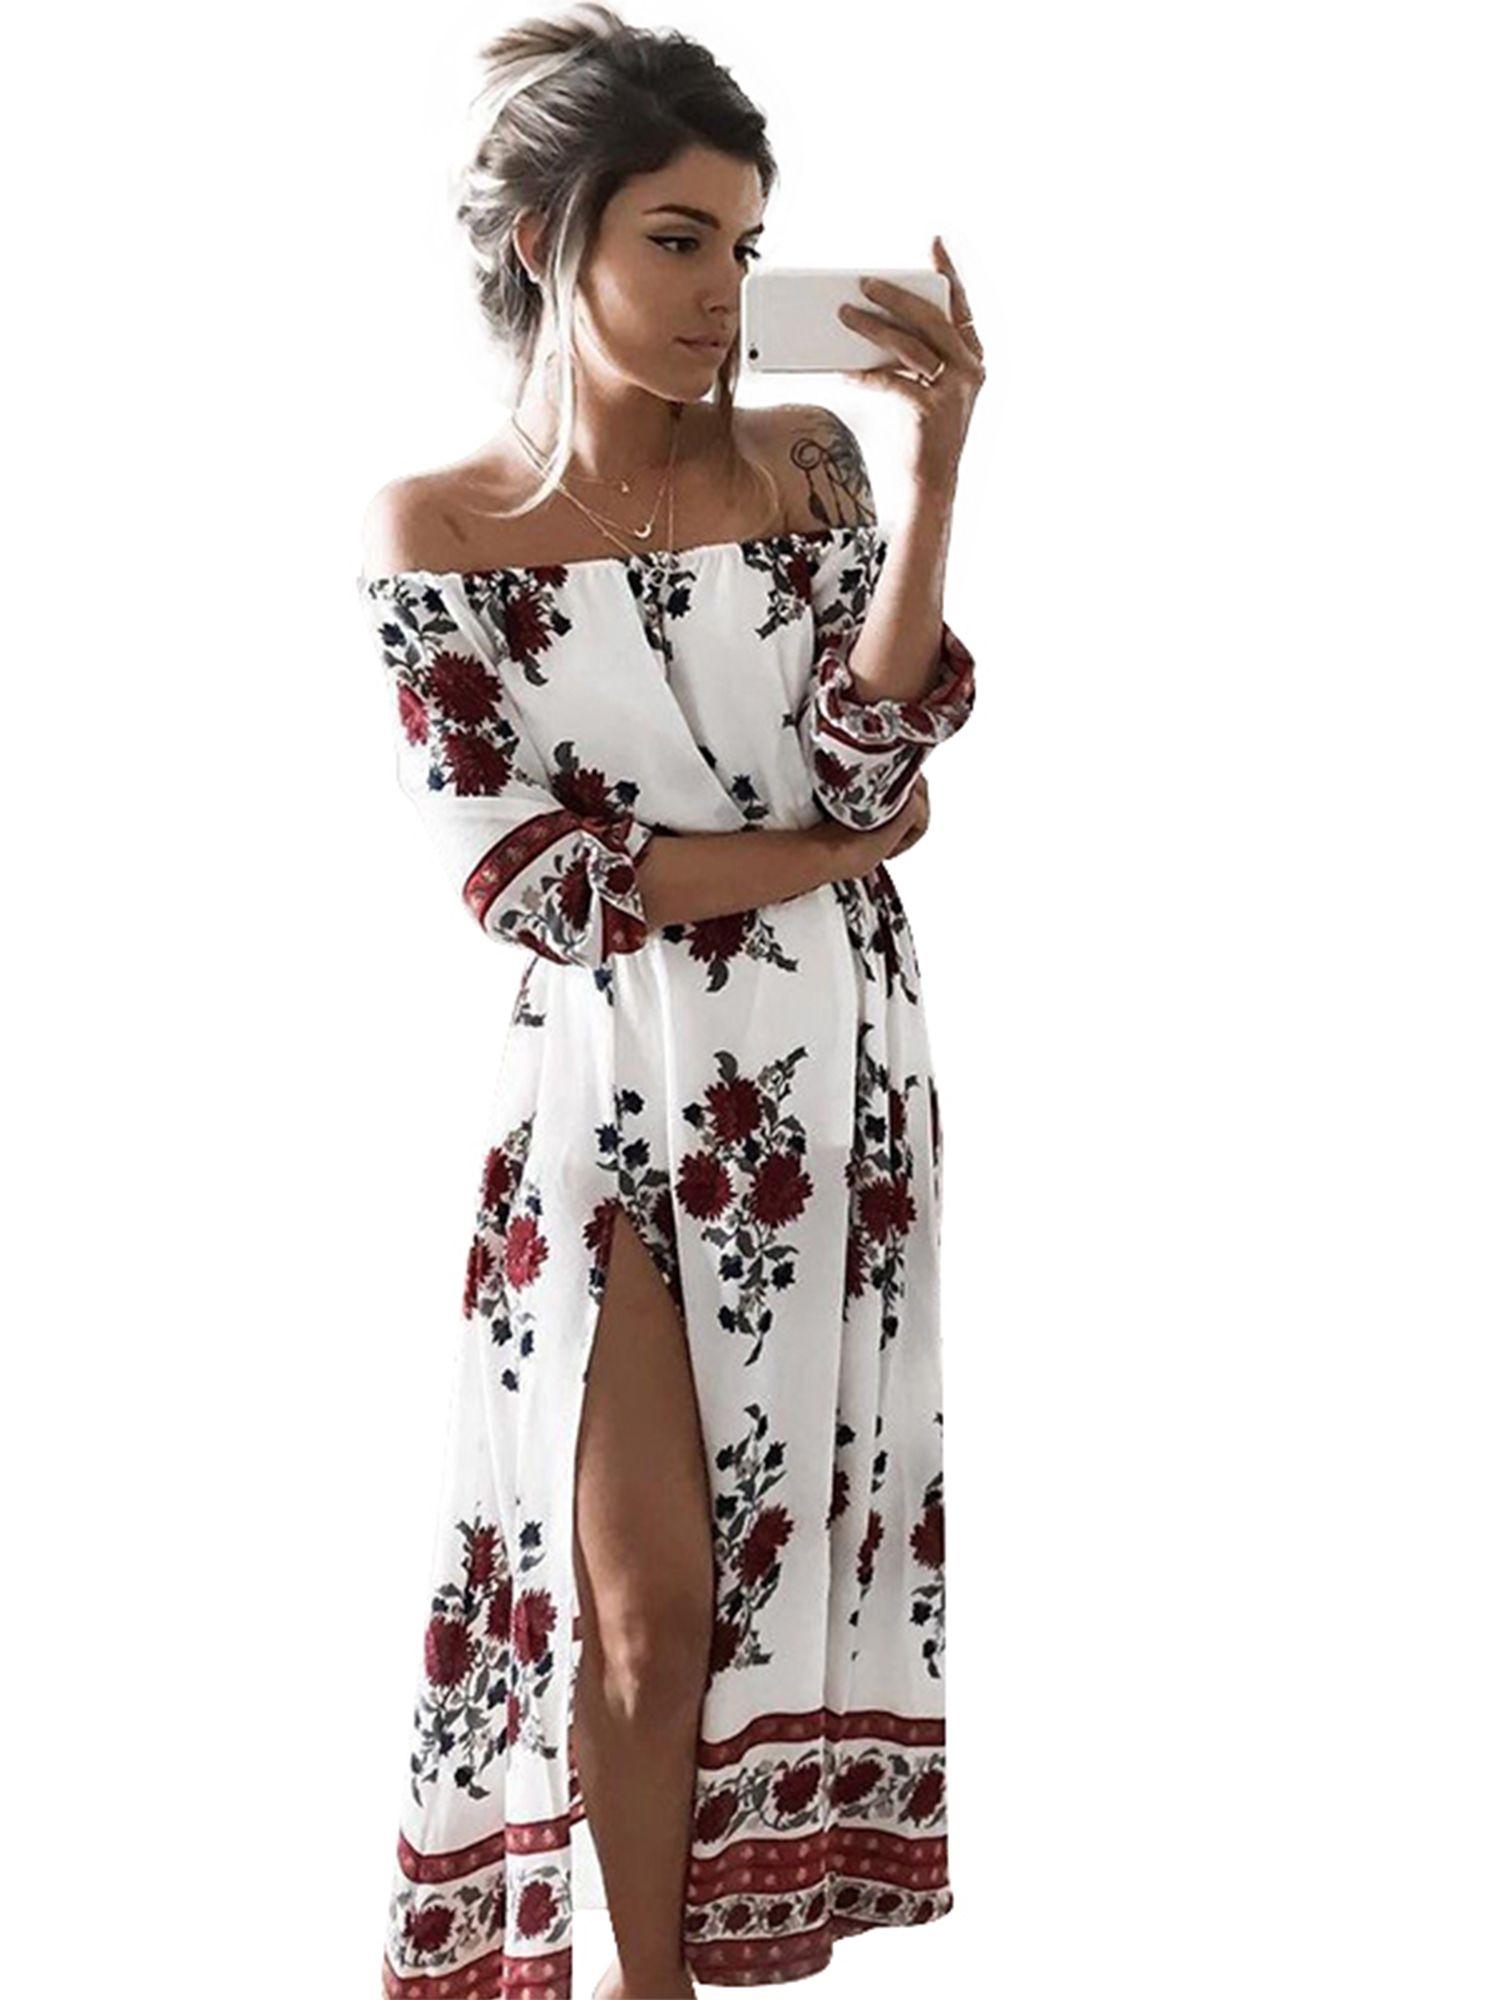 Wodstyle Women Off Shoulder Floral Evening Party Split Maxi Dress Walmart Com In 2021 Boho Dresses Long Floral Print Dress Summer Women S Fashion Dresses [ 2000 x 1500 Pixel ]